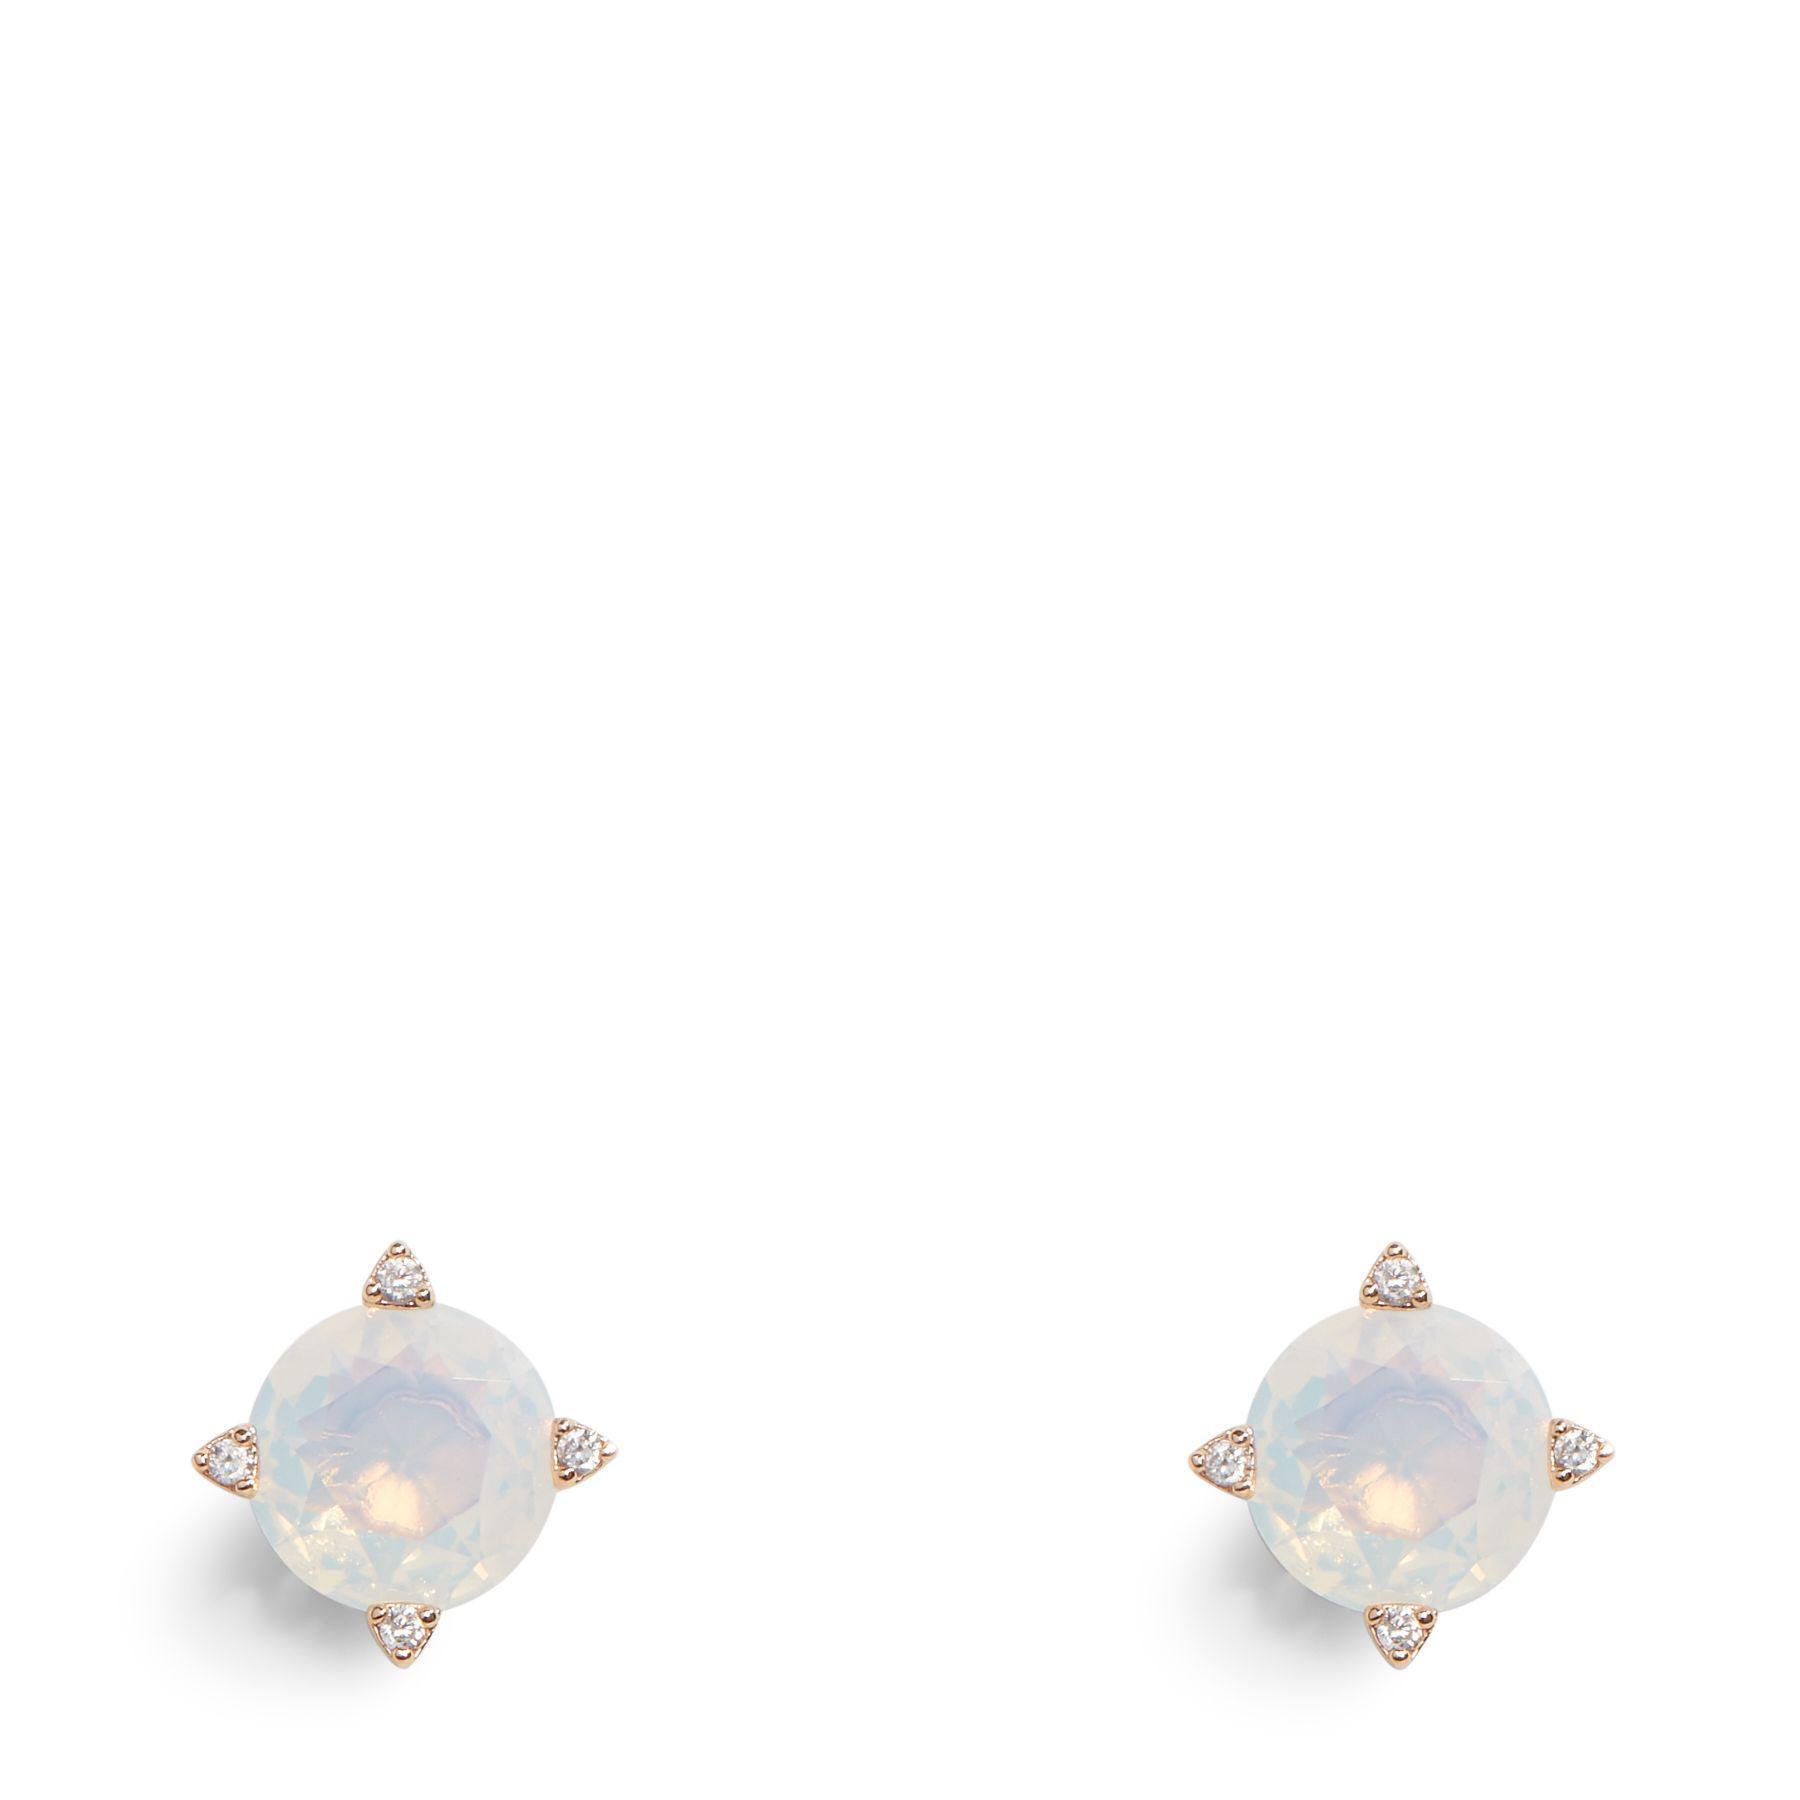 364b35f2451cc Lyst - Vera Bradley Sparkling Stud Earrings